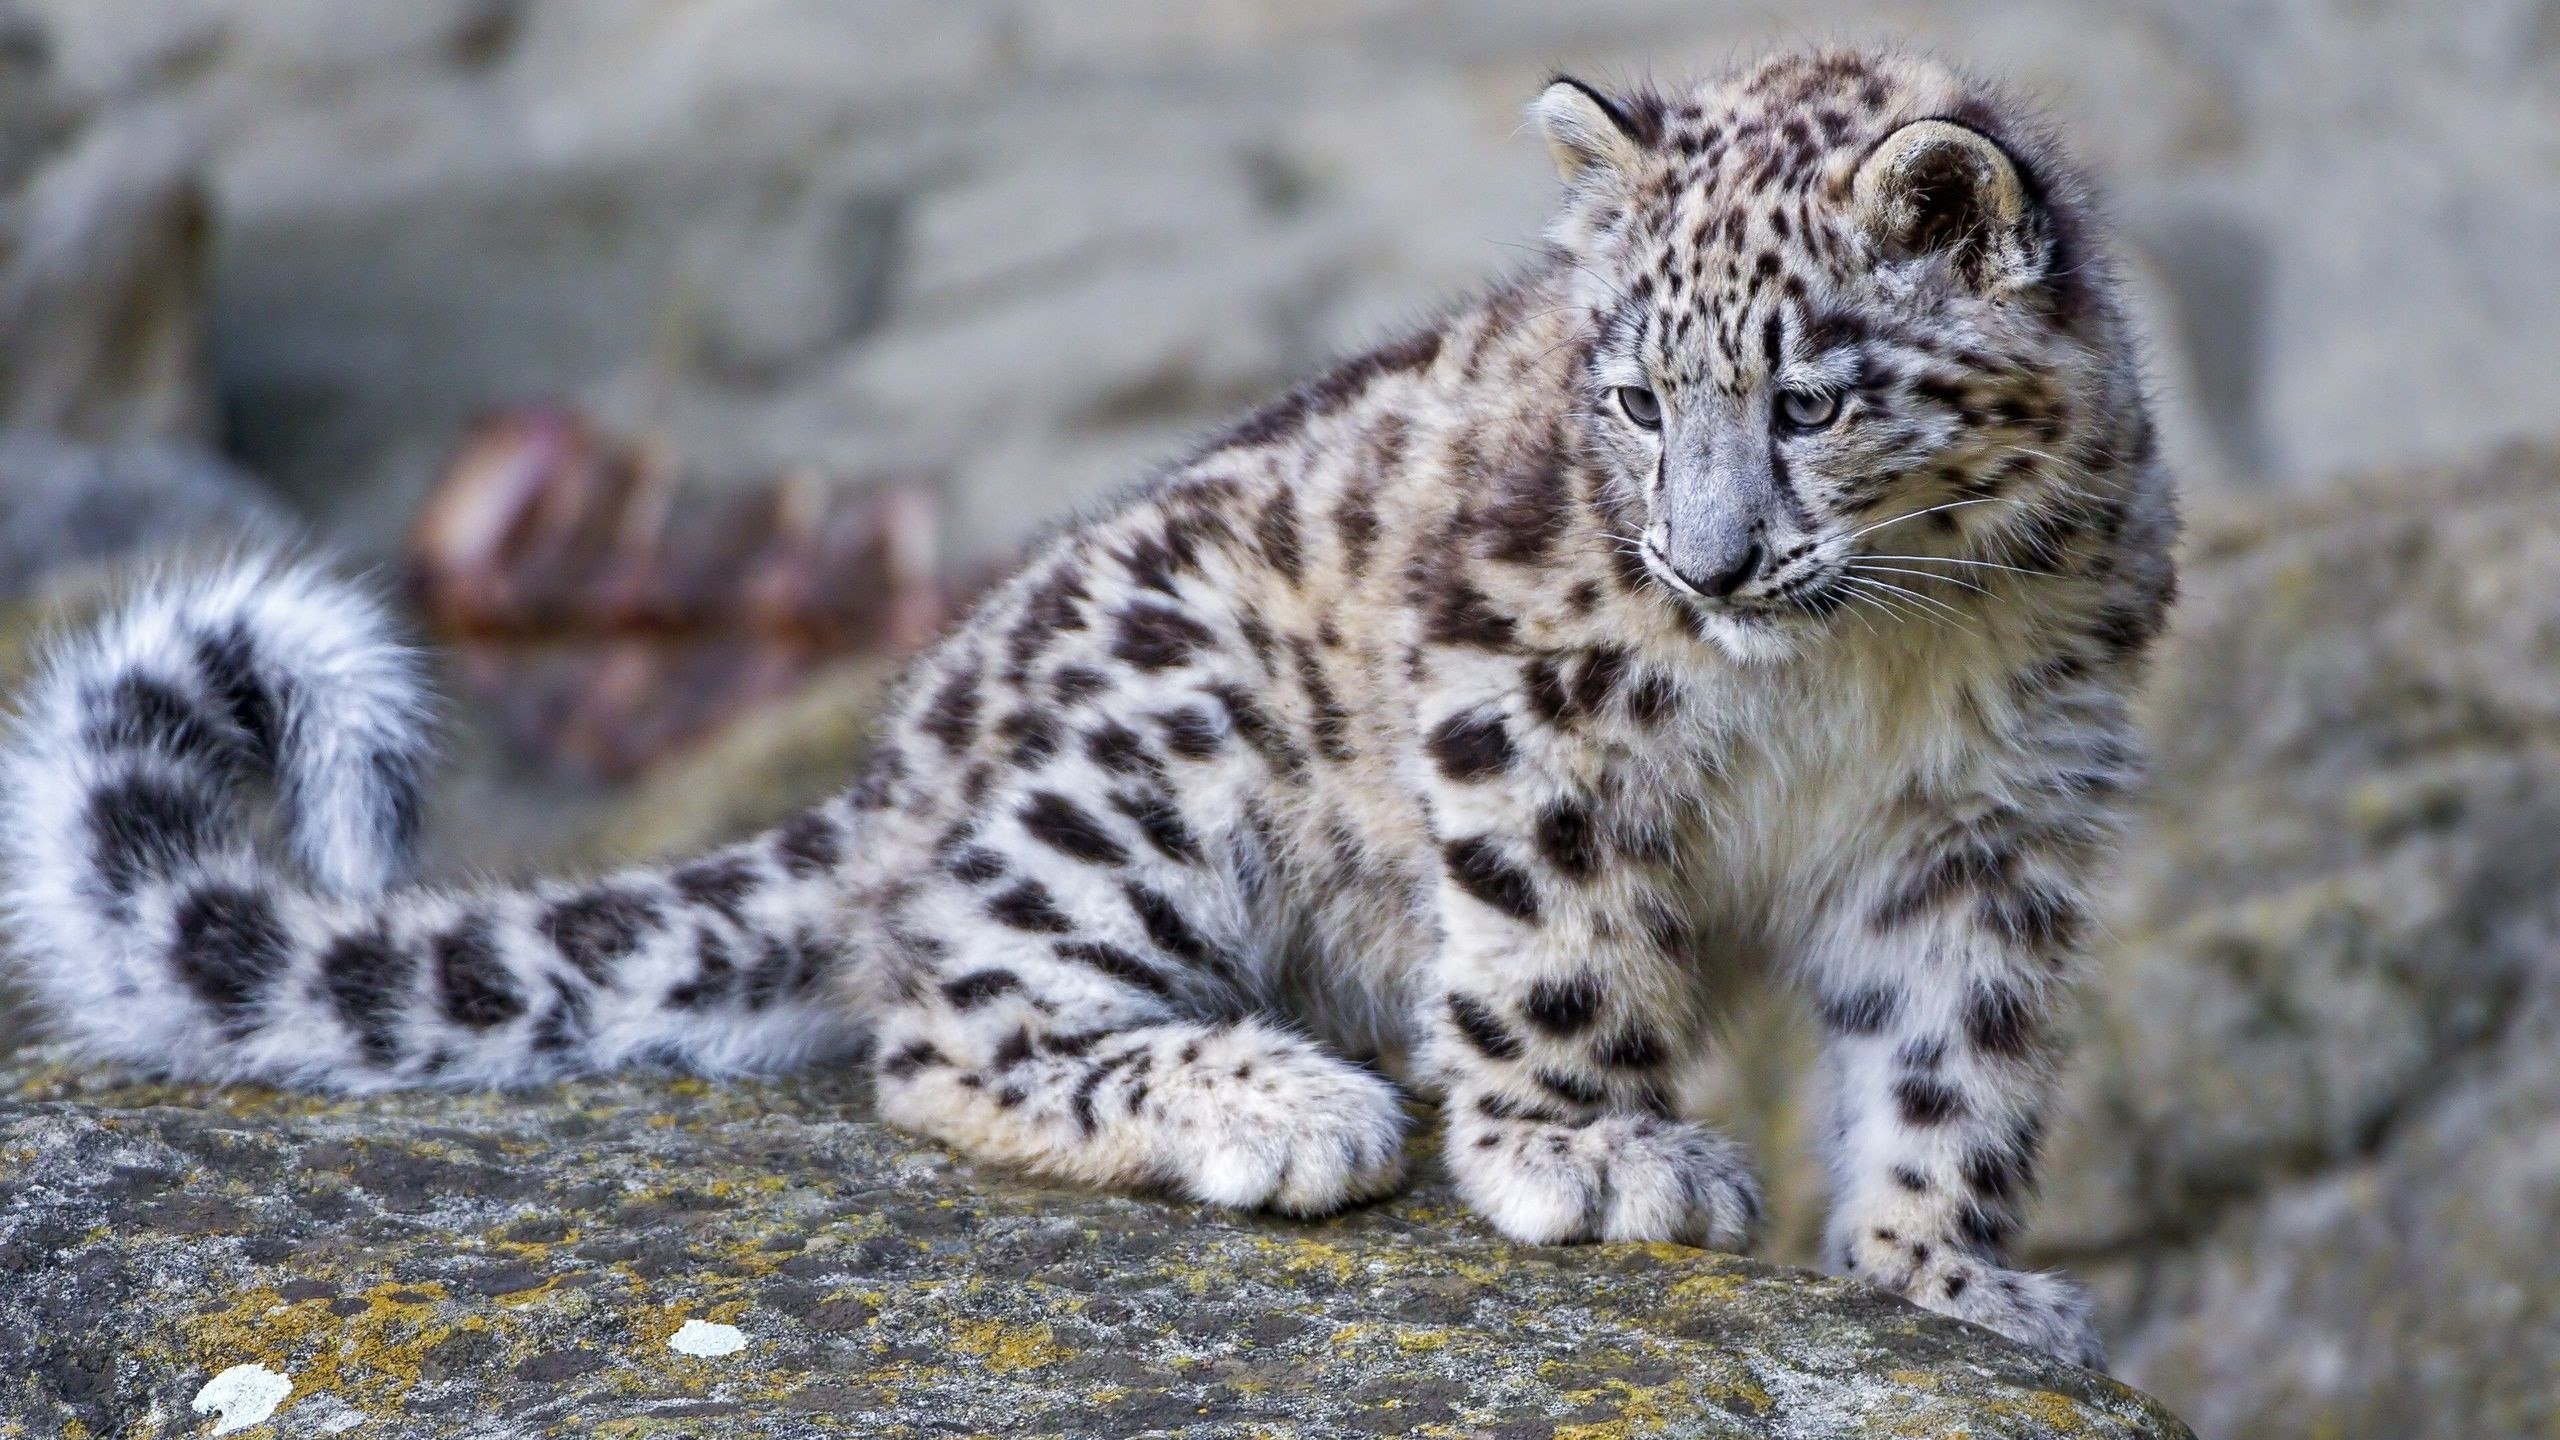 Simple Wallpaper Mac Snow Leopard - 1133685-full-size-mac-os-x-snow-leopard-wallpaper-hd-2560x1440  2018_475474.jpg